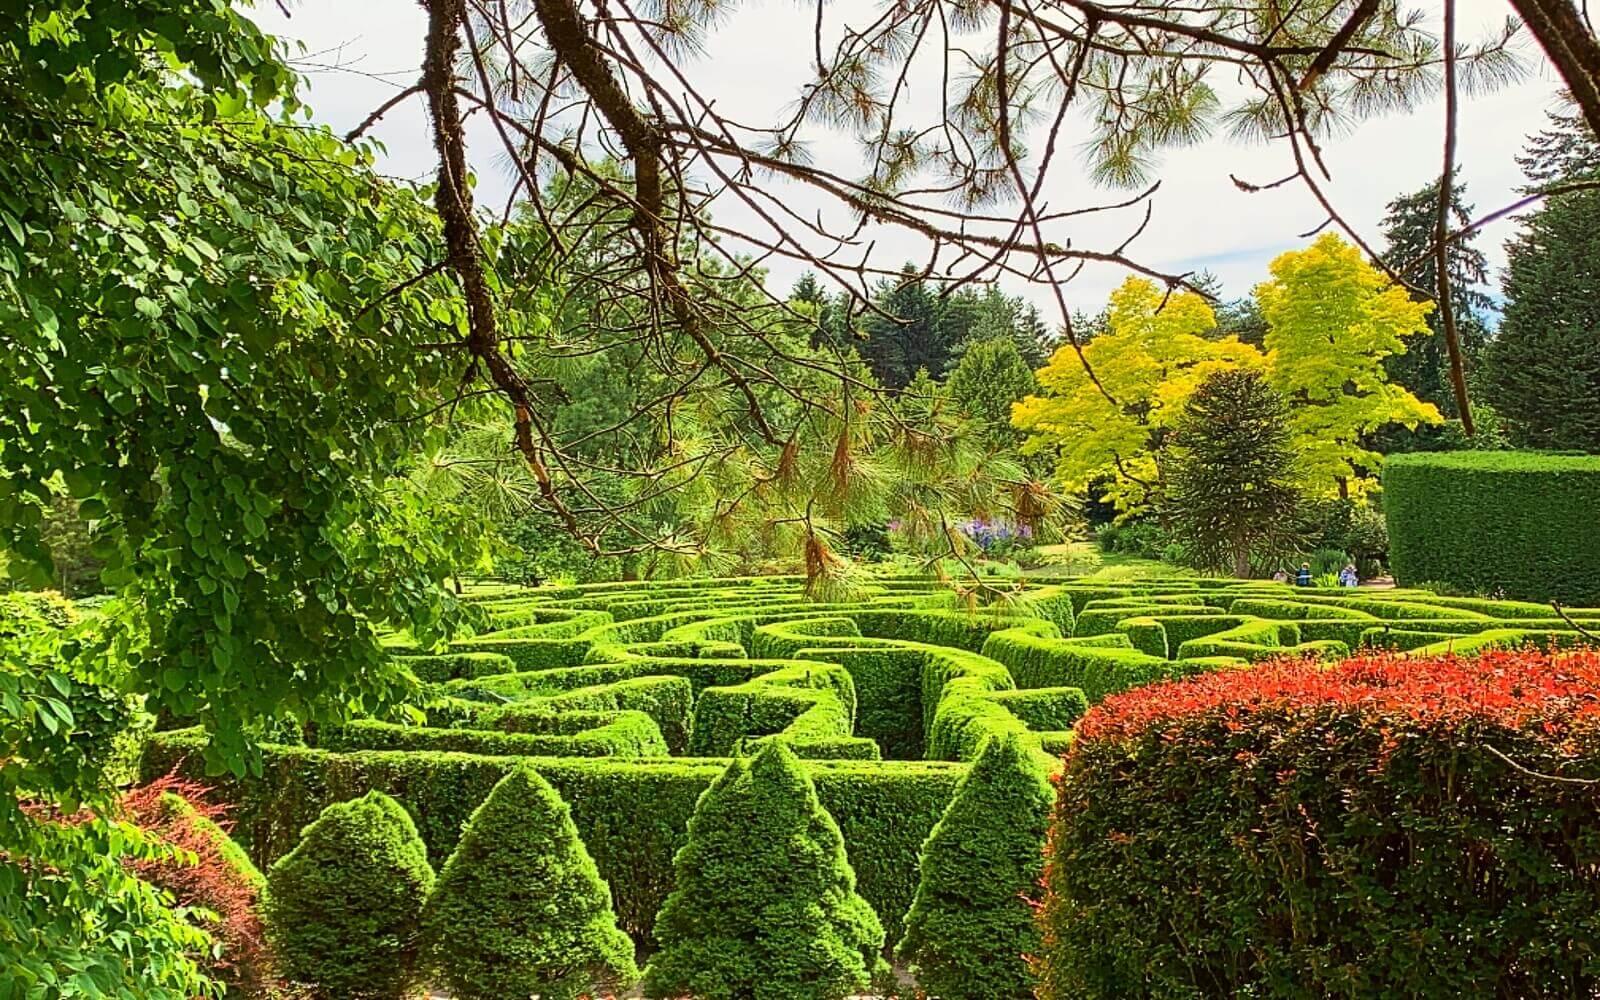 The Elizabethan Maze at VanDusen Garden